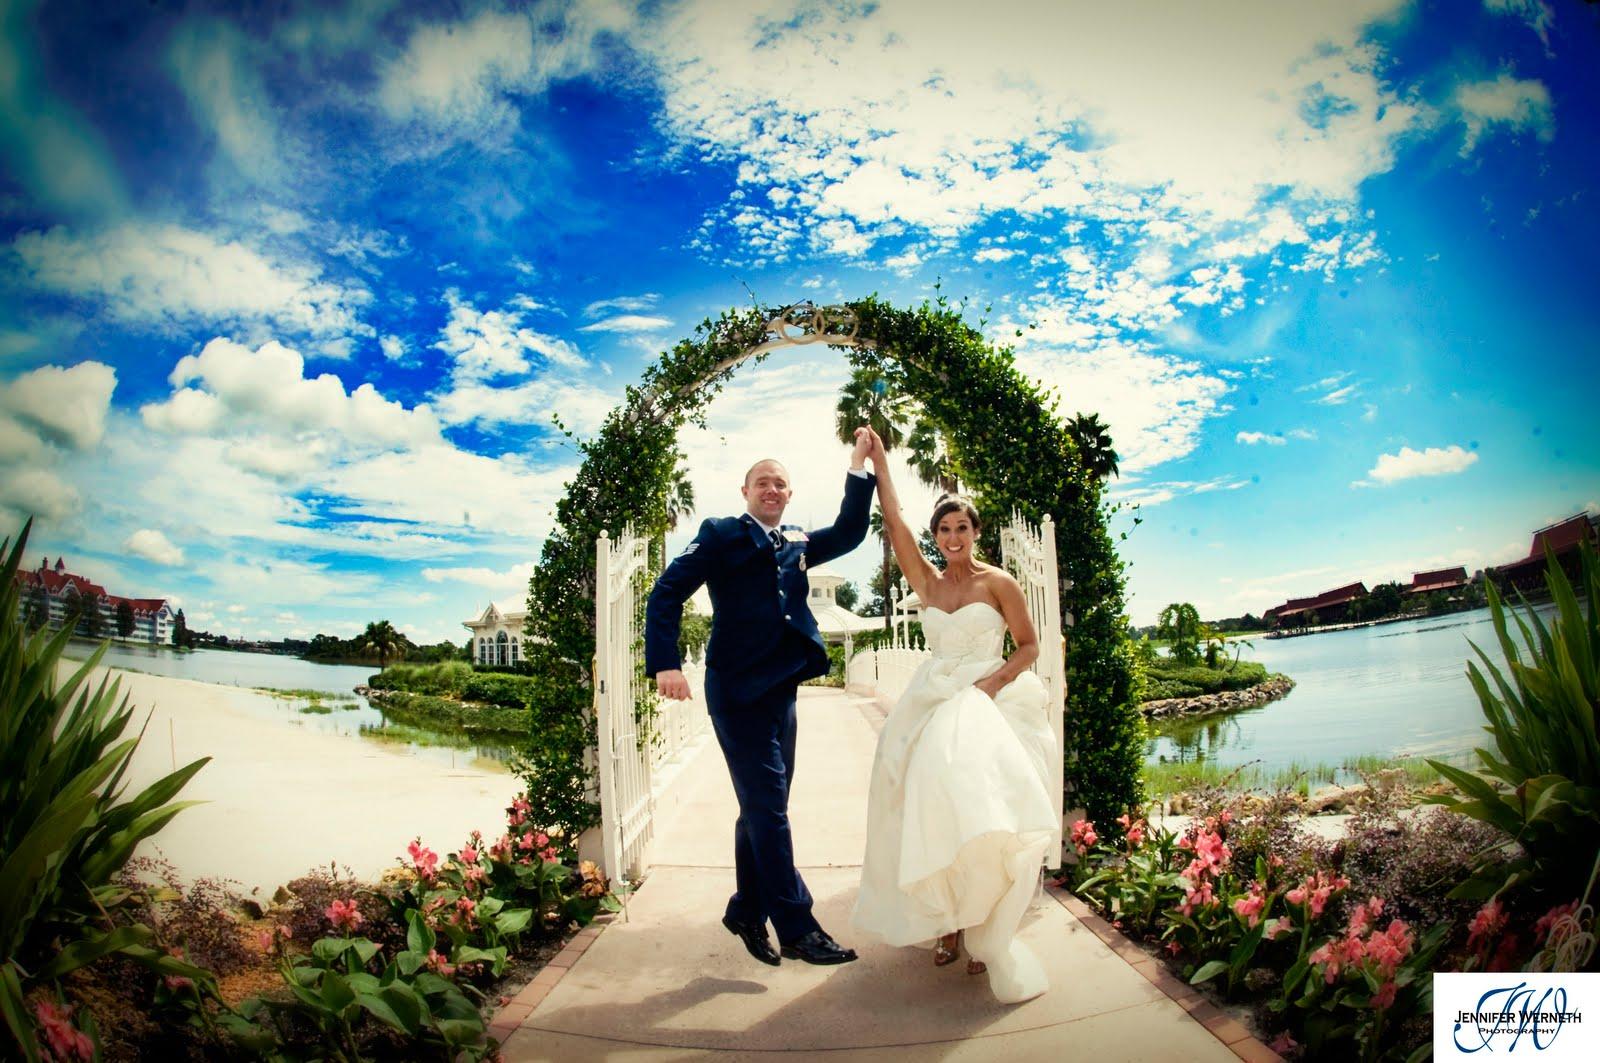 Wedding Photography At The Walt Disney World Pavillion Orlando Fl And Desert Party Epcotl